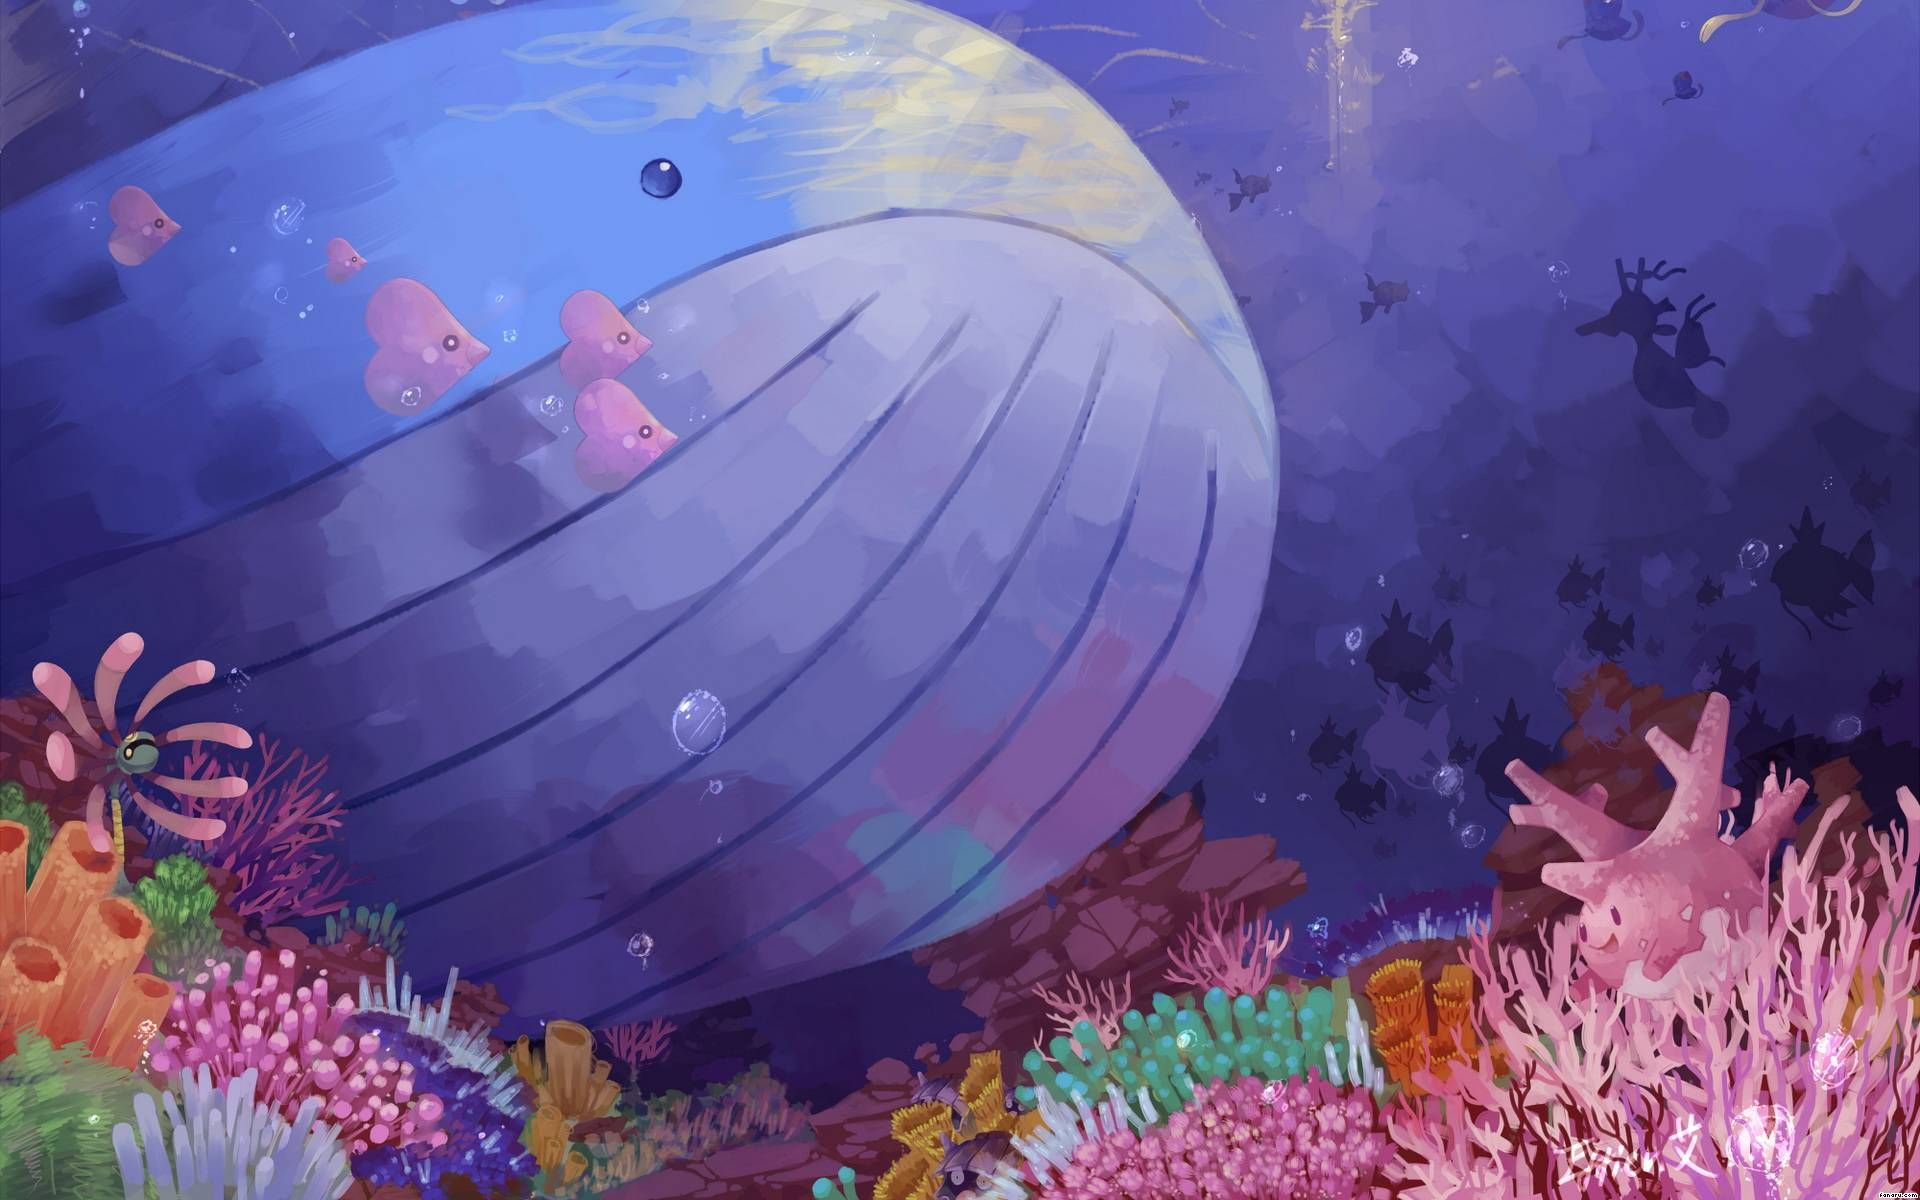 Wailord Wallpaper from Pokemon. the sea | ポケモン | Pinterest ... Wailord Wallpaper